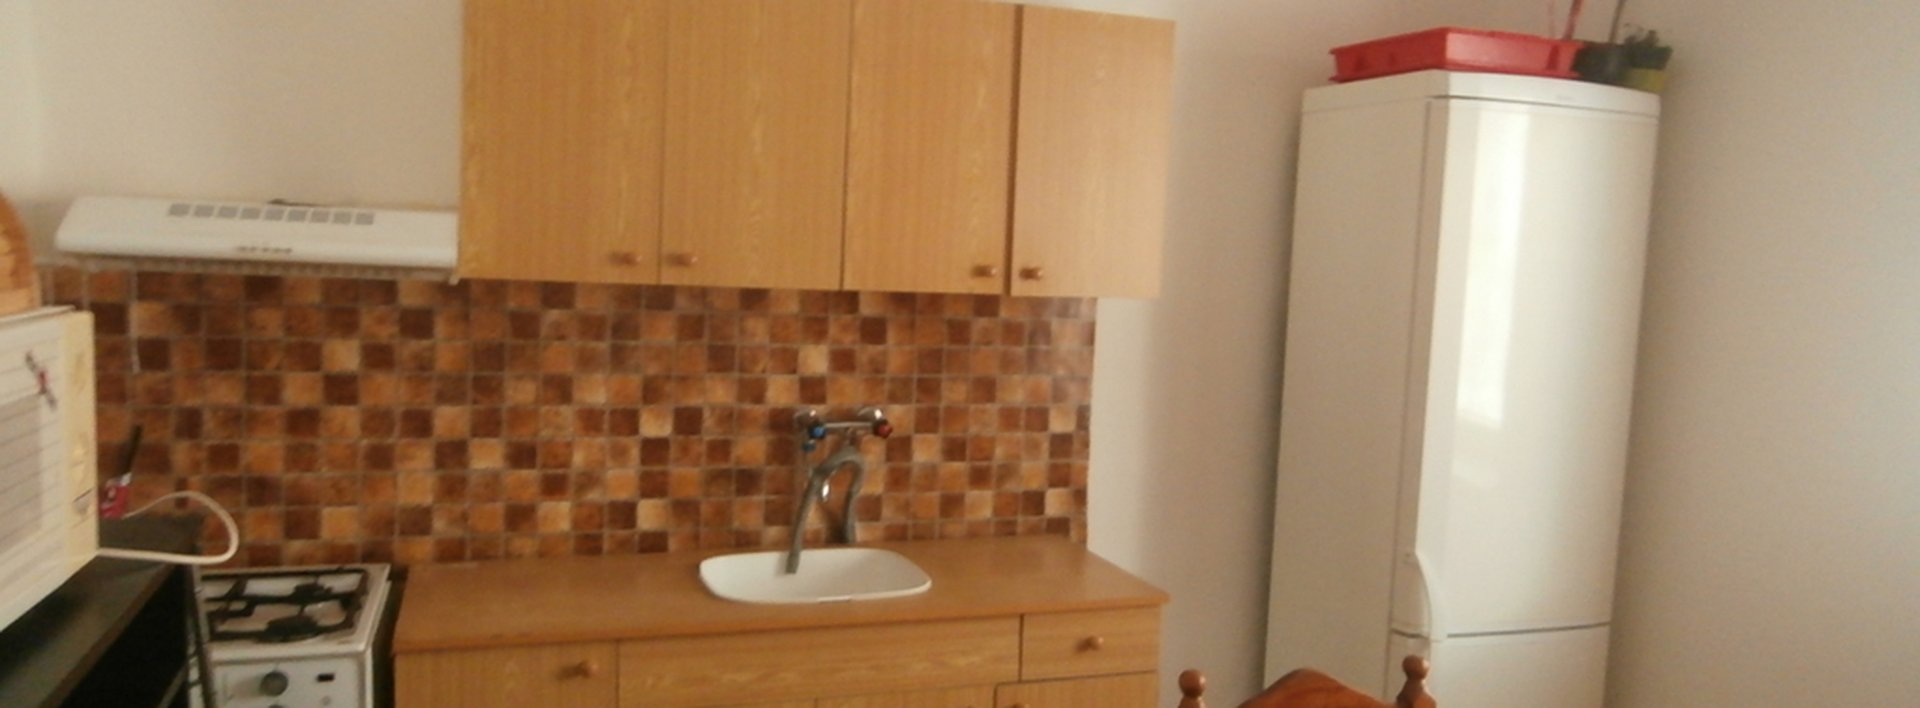 Pronájem bytu 1+1, 40 m2 v Jablonci n/N, Ev.č.: N47186